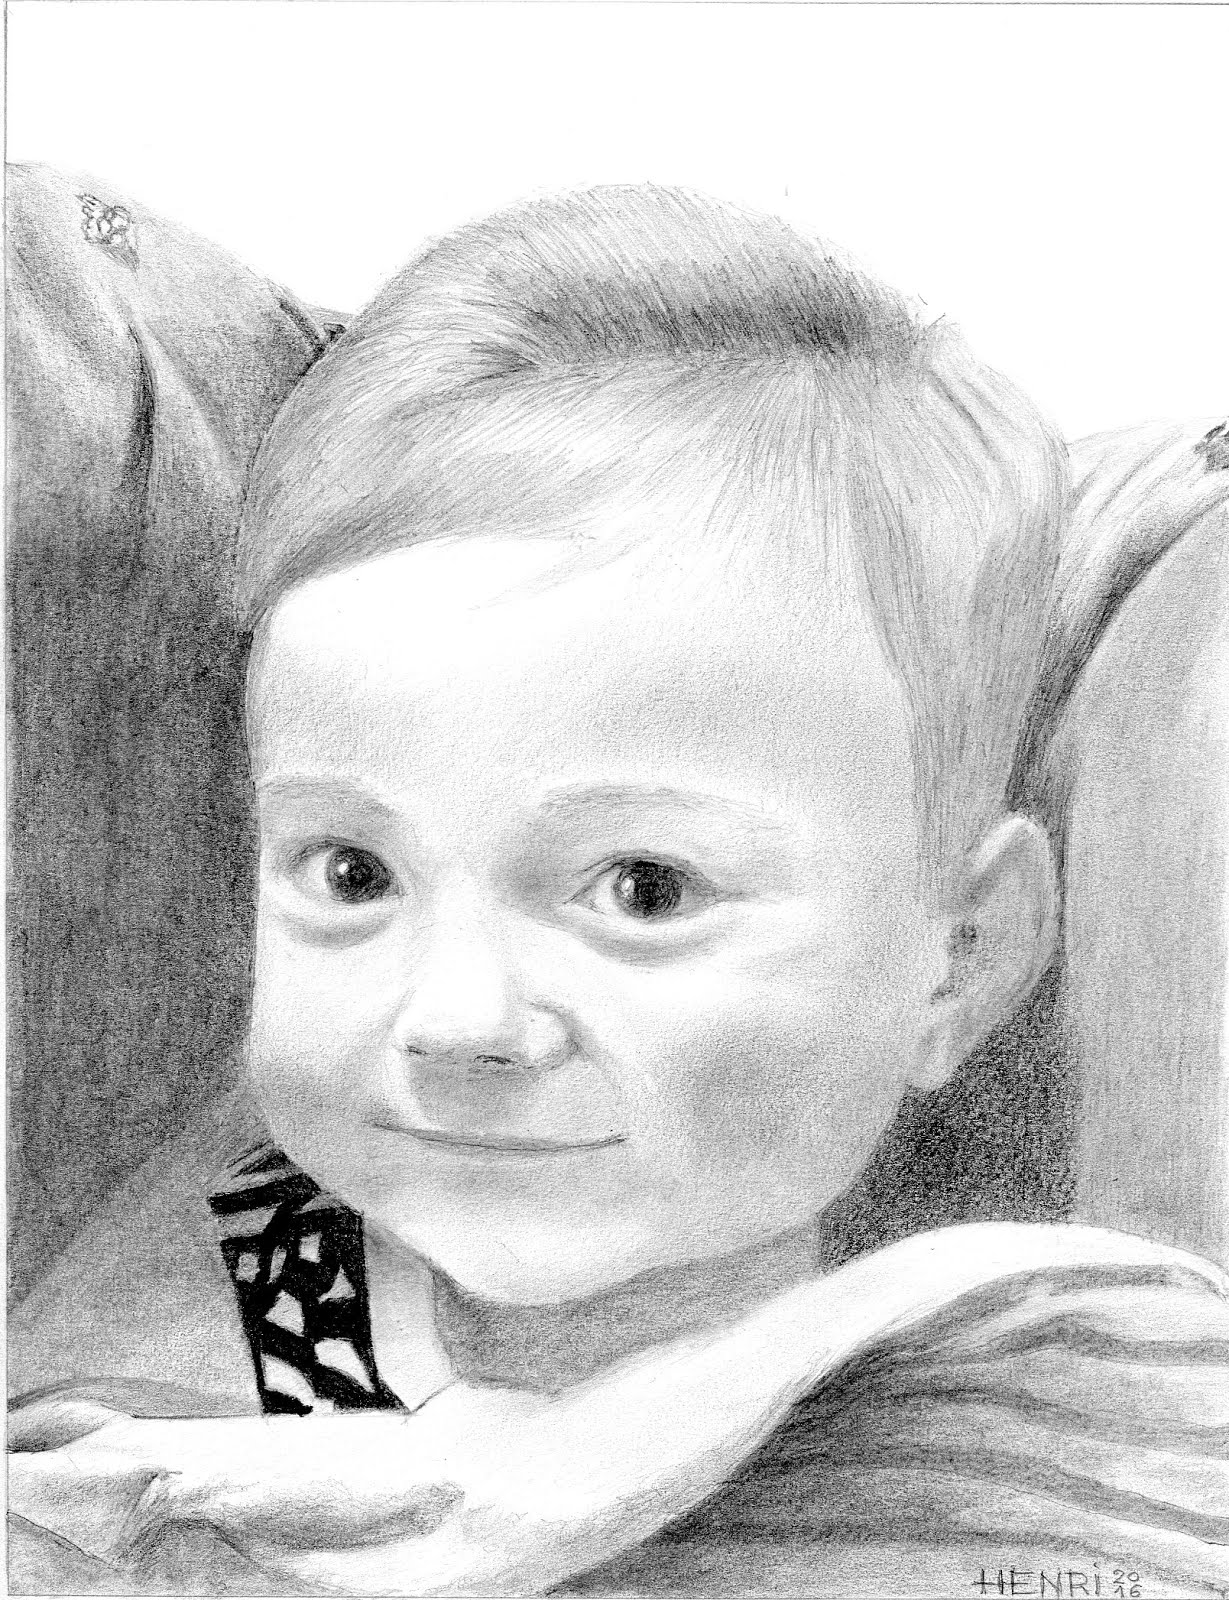 Mon petit neveu Rohann